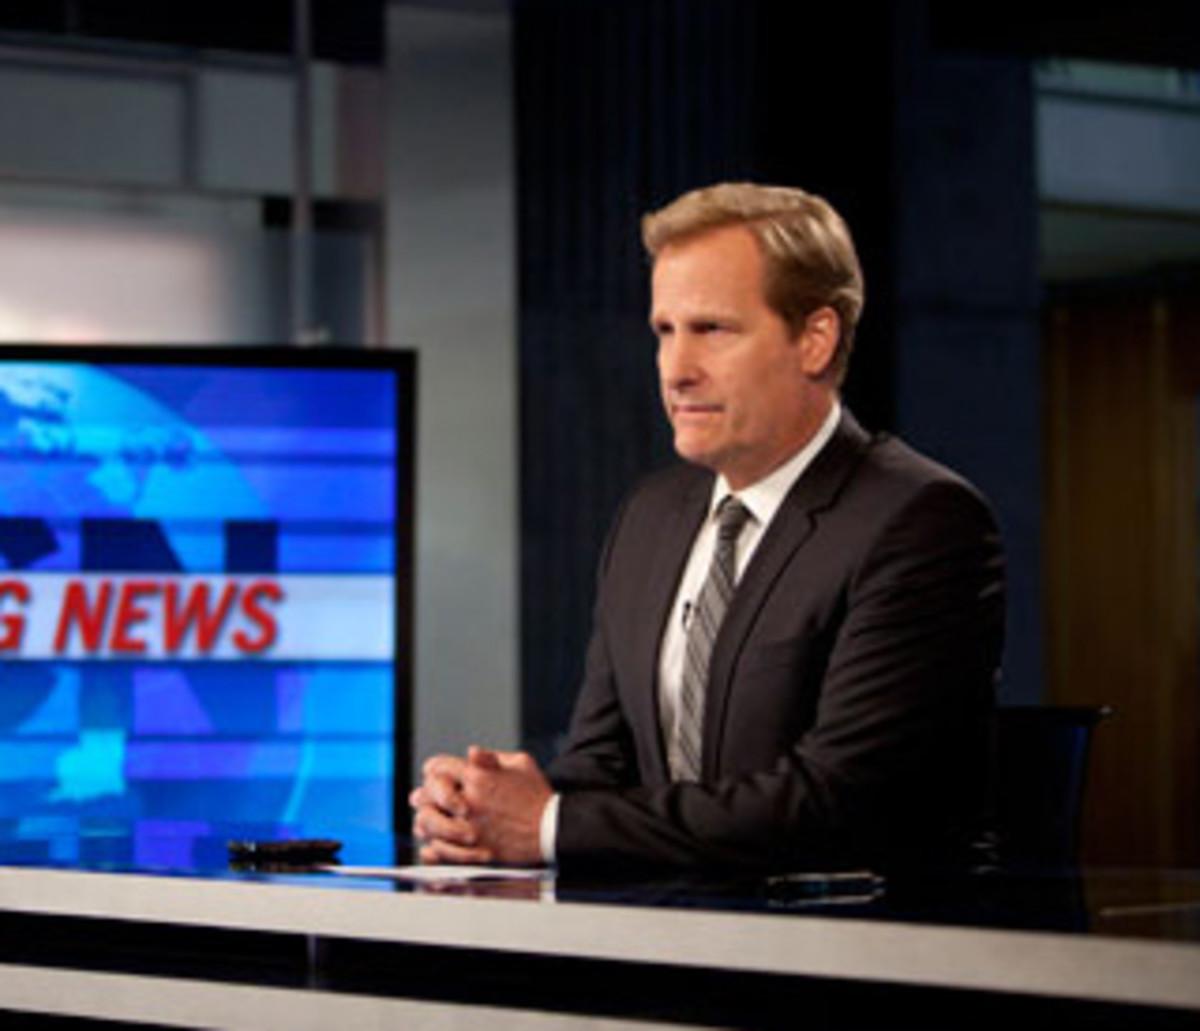 newsroom_daniels